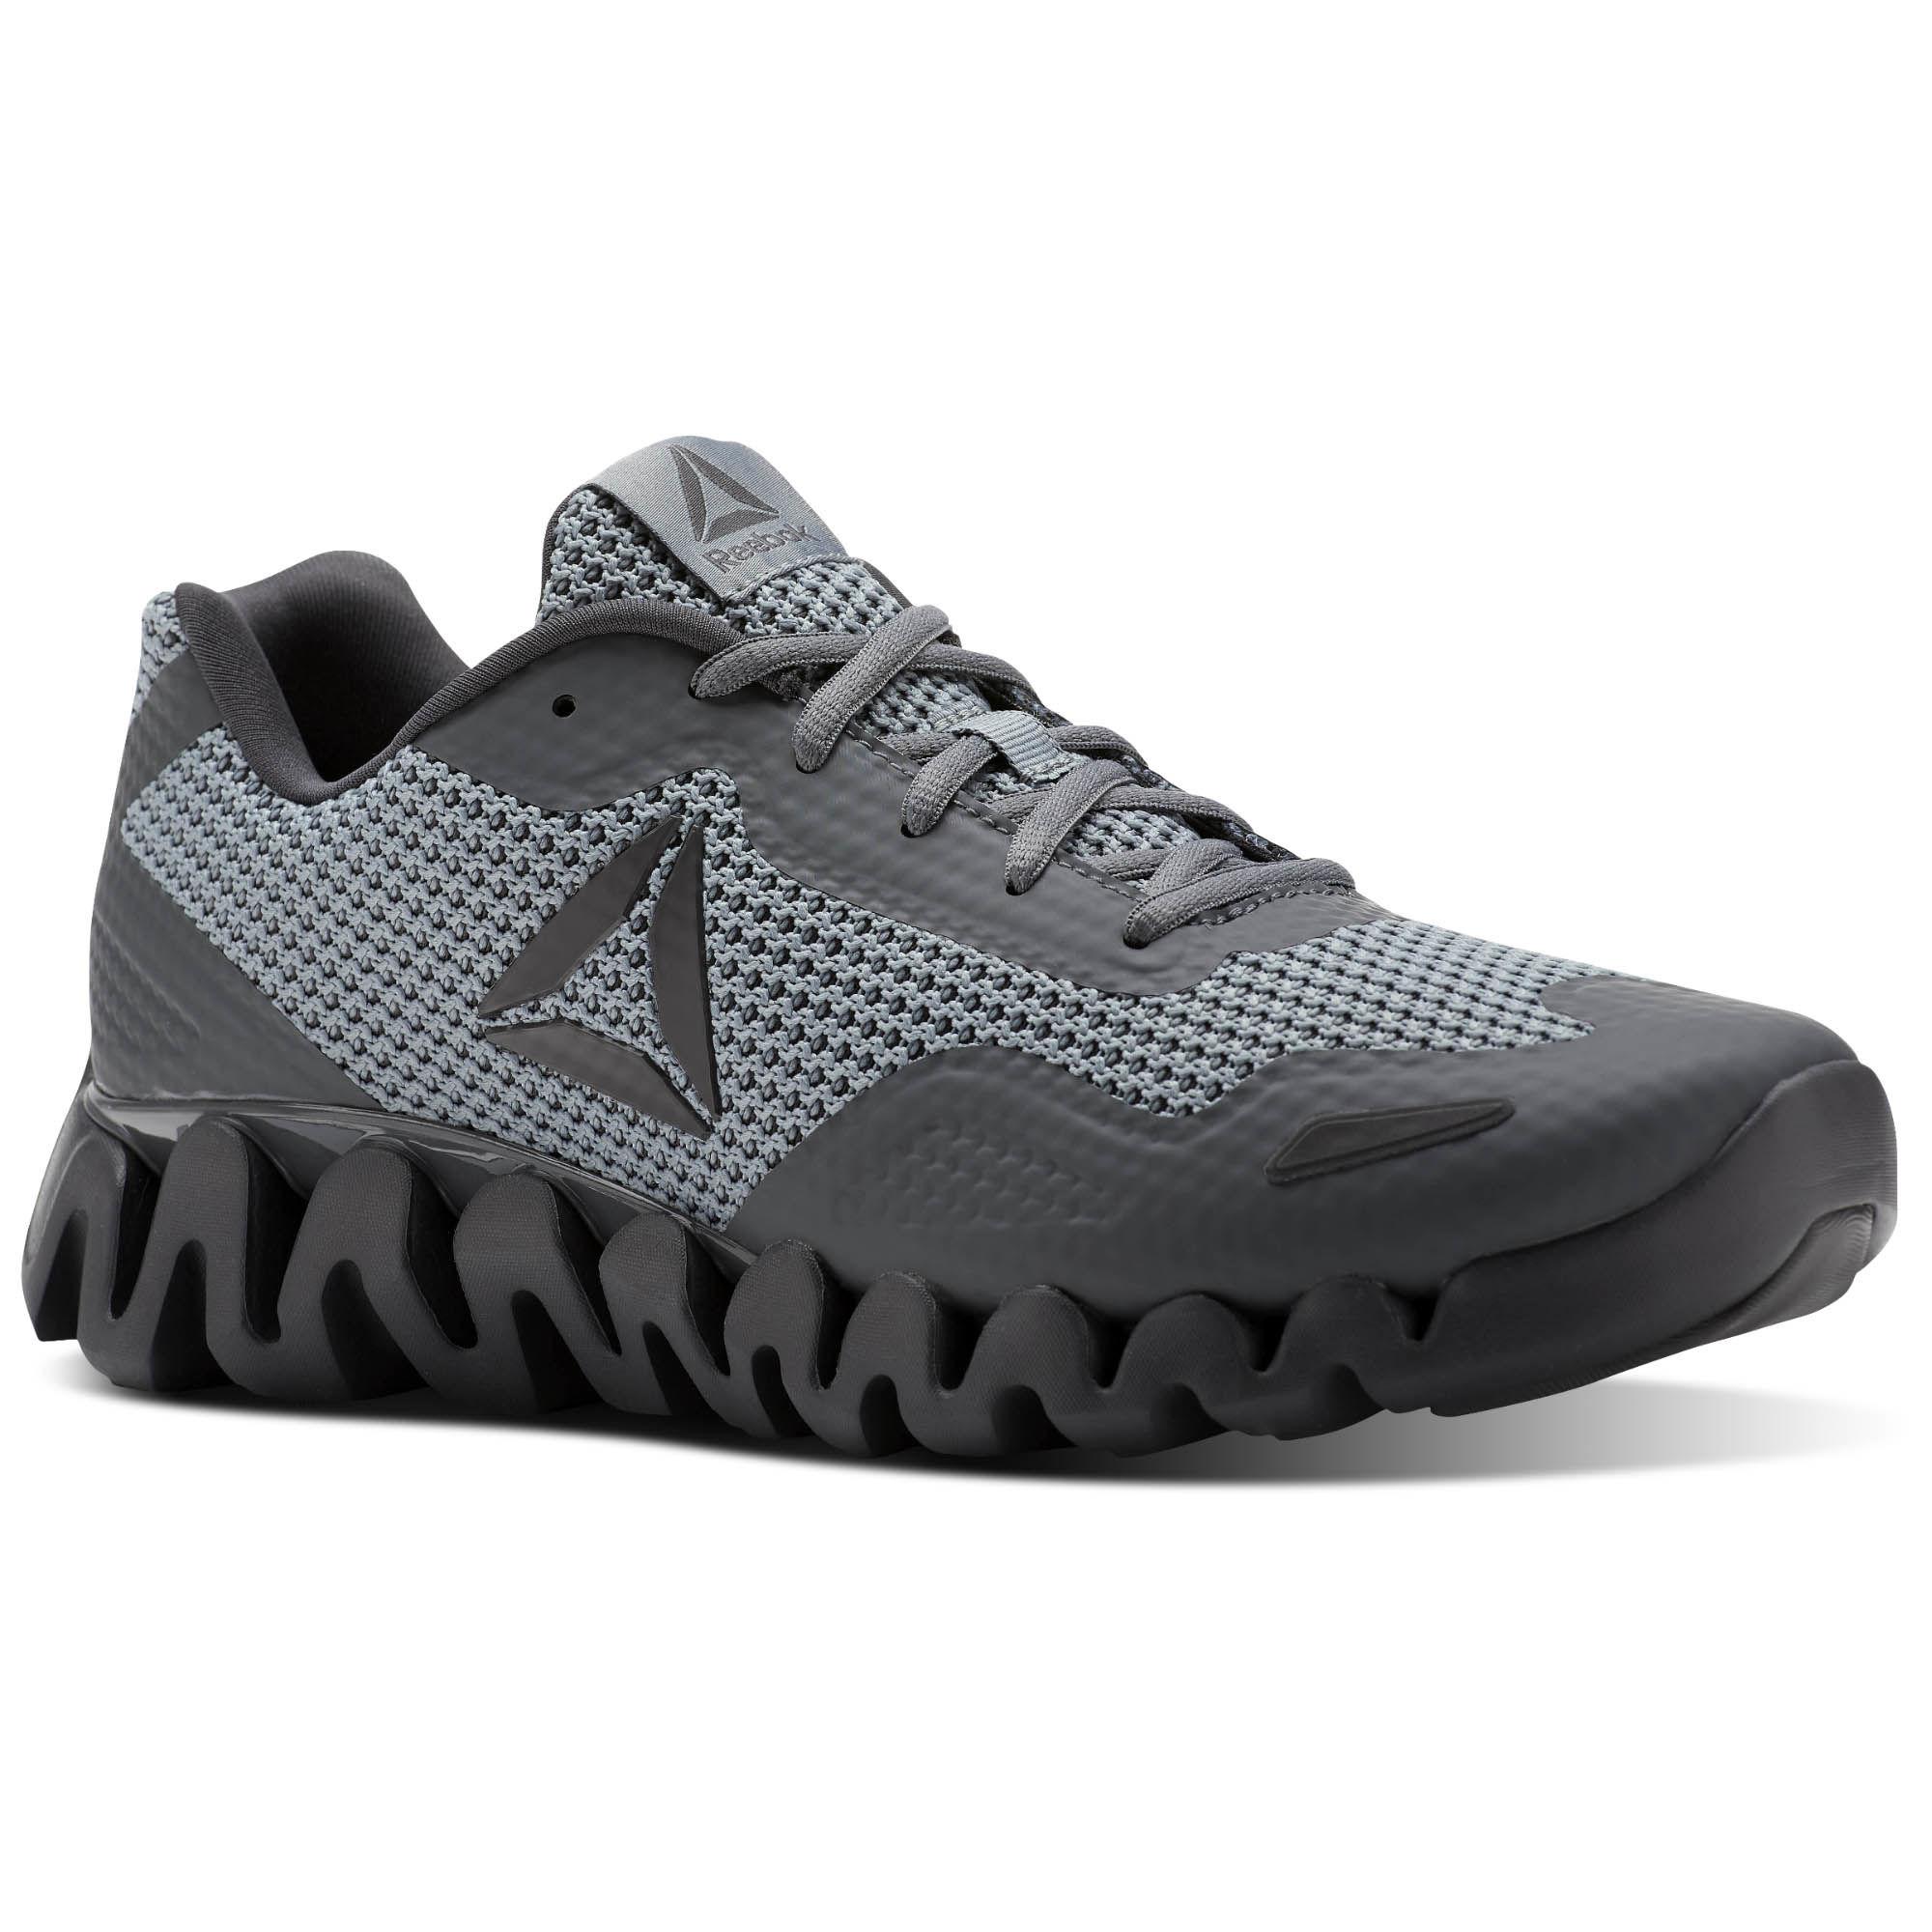 63cd36faeadc7f Reebok Zig Pulse SE Men s Running Shoes - Slickdeals.net